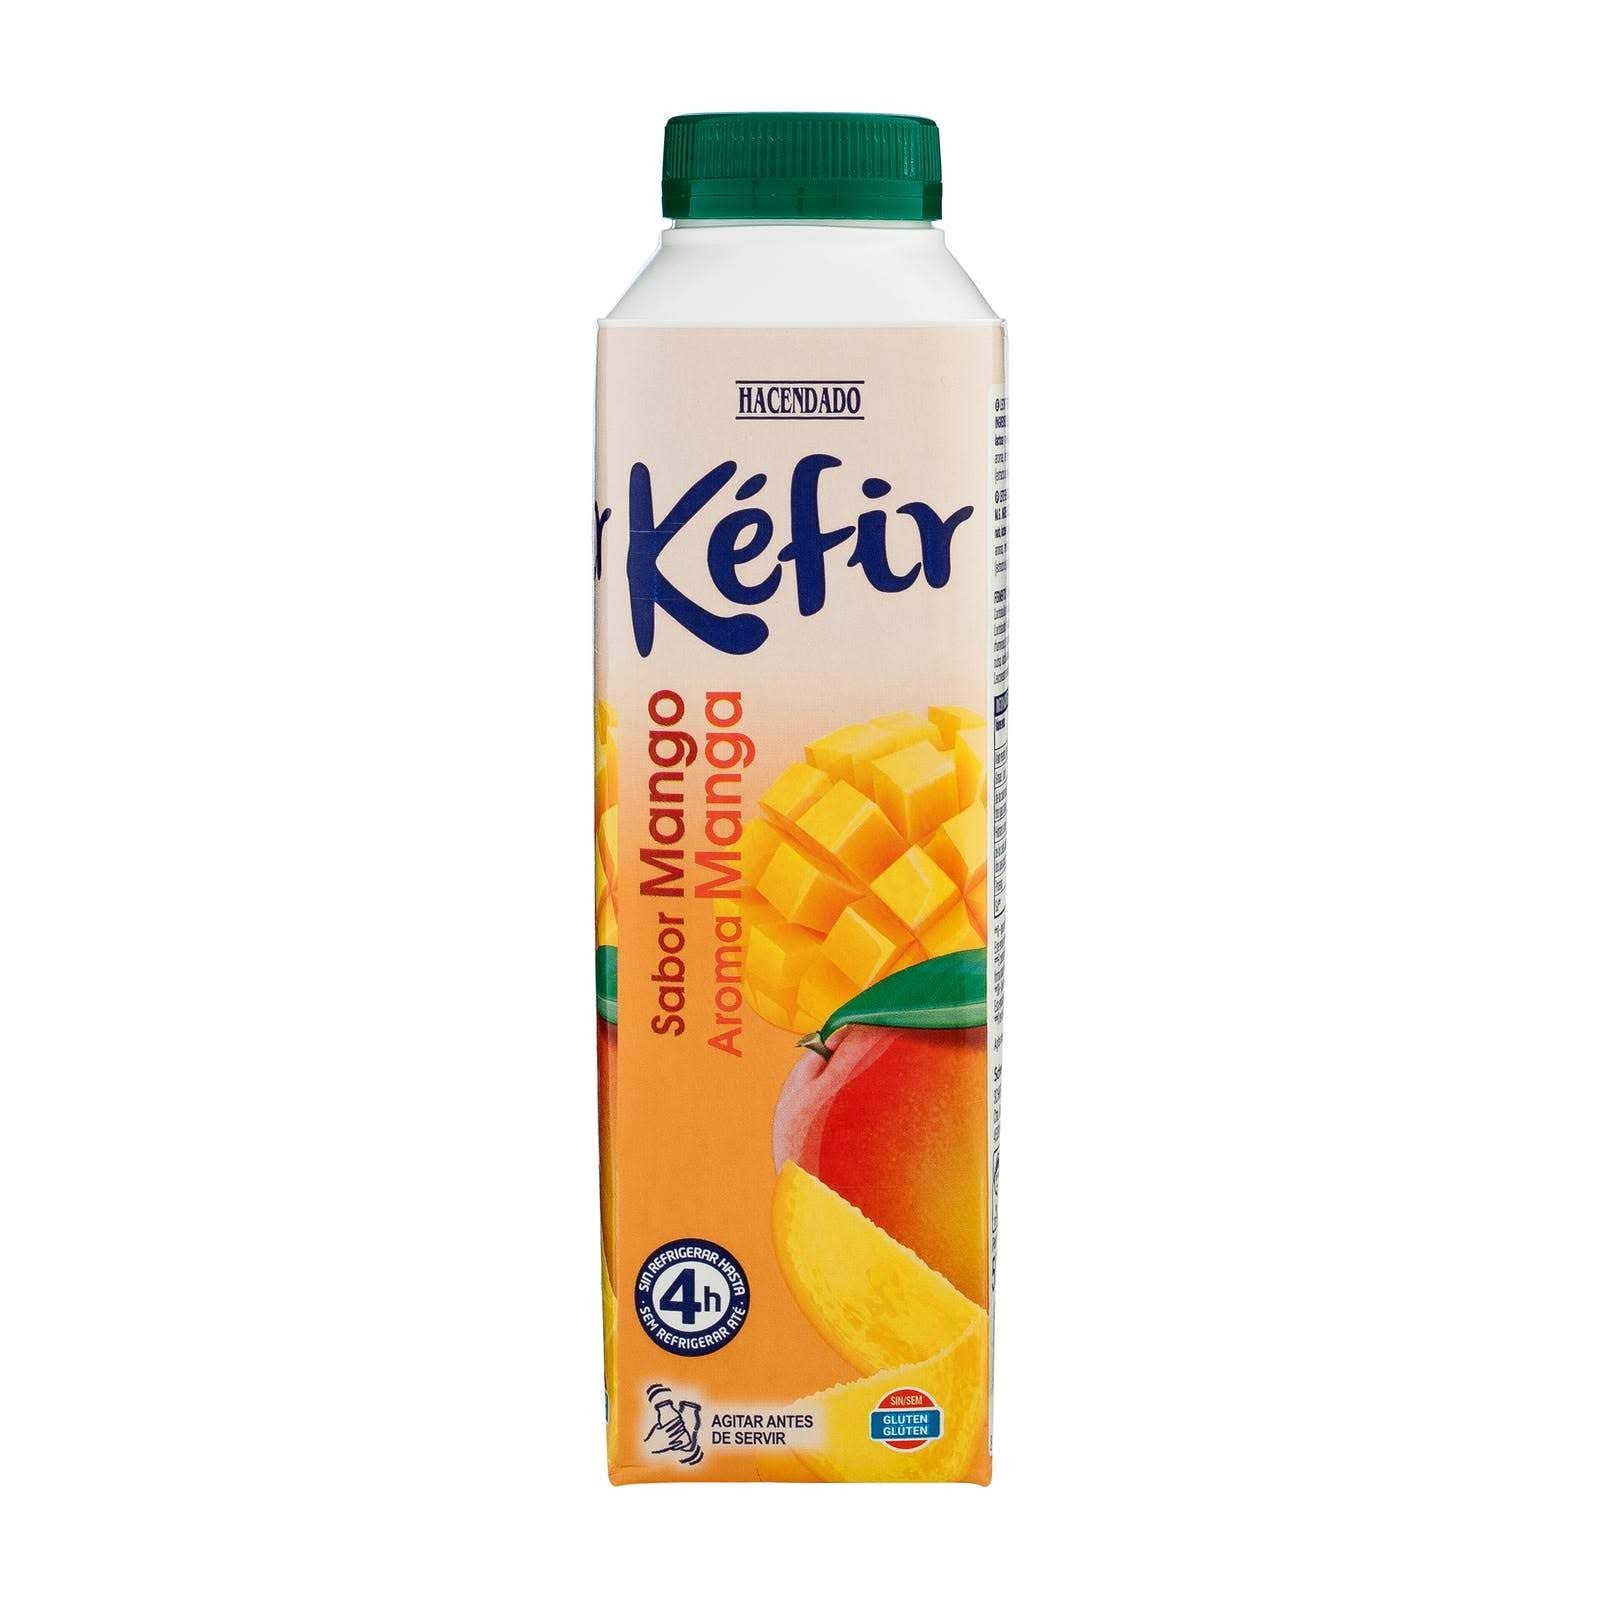 Kéfir sabor mango Hacendado